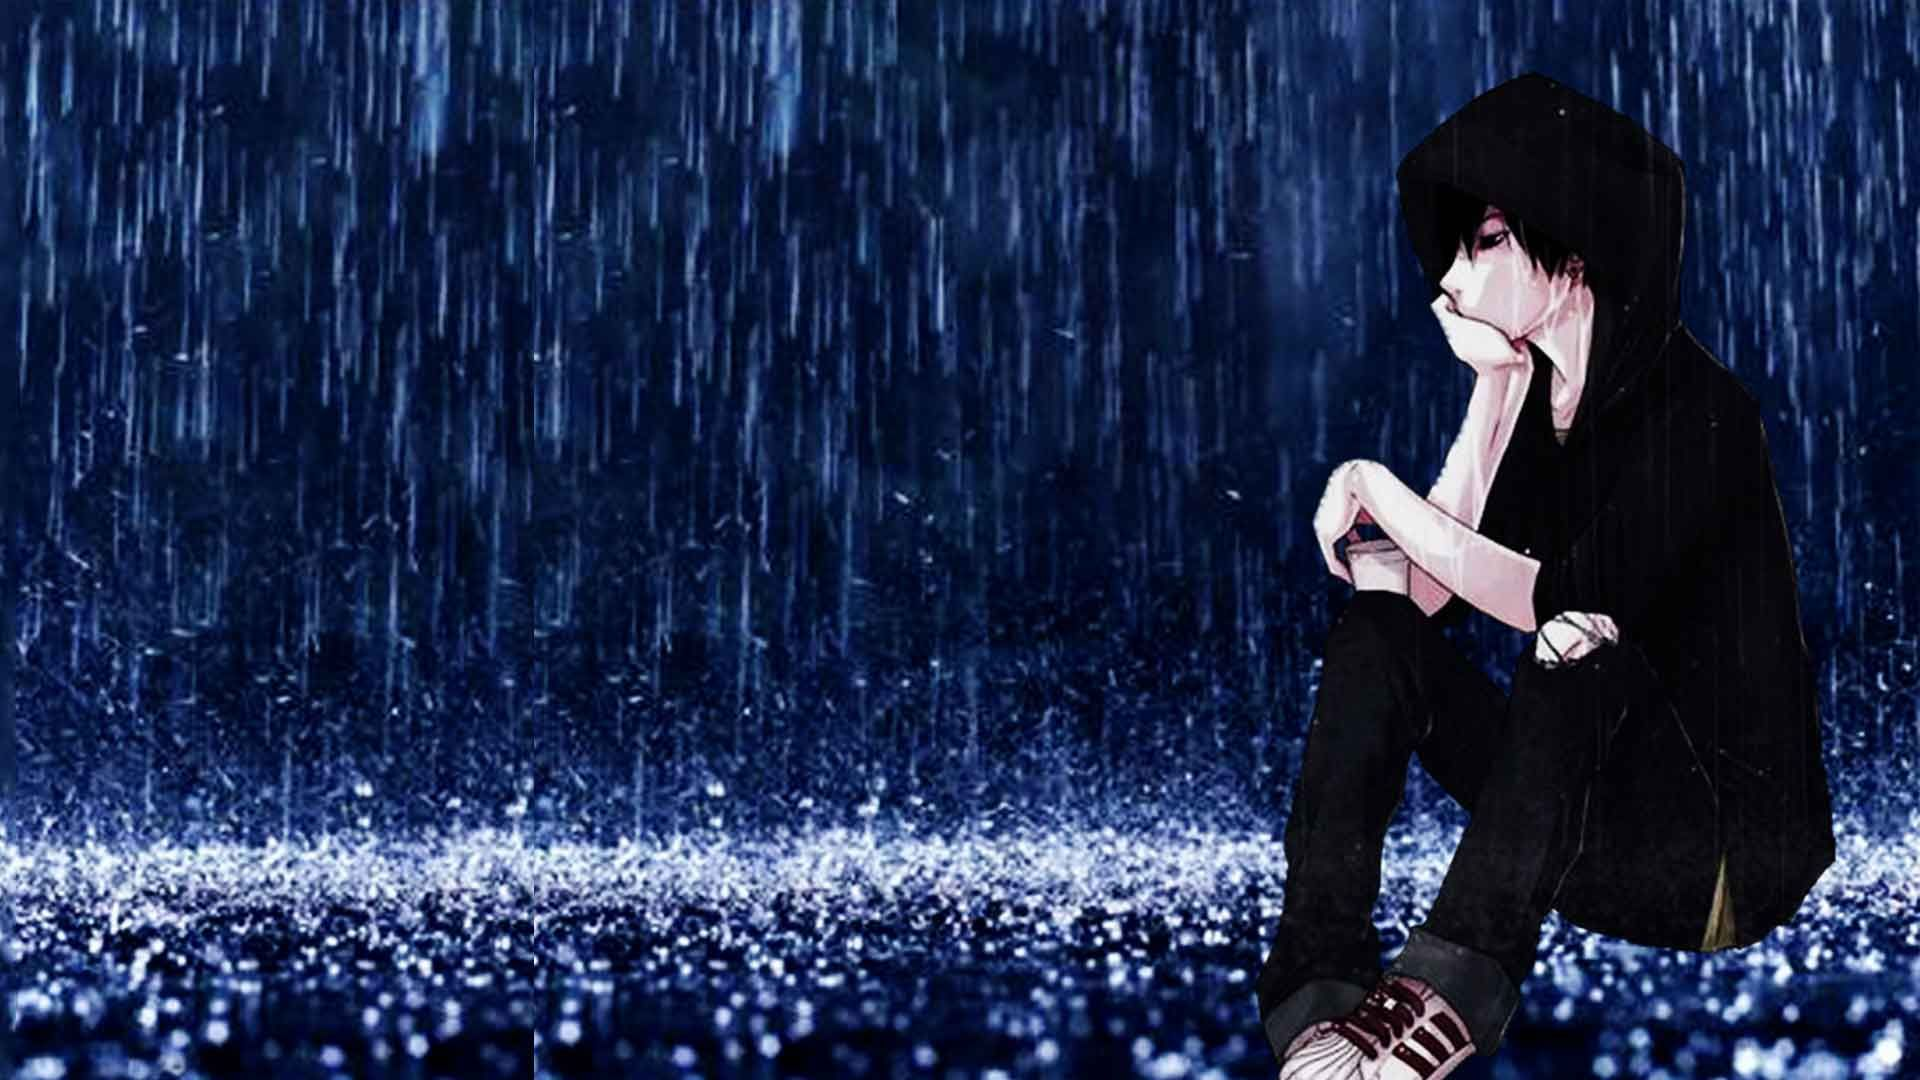 Sad anime boy images sad cartoon boy alone pic sadever